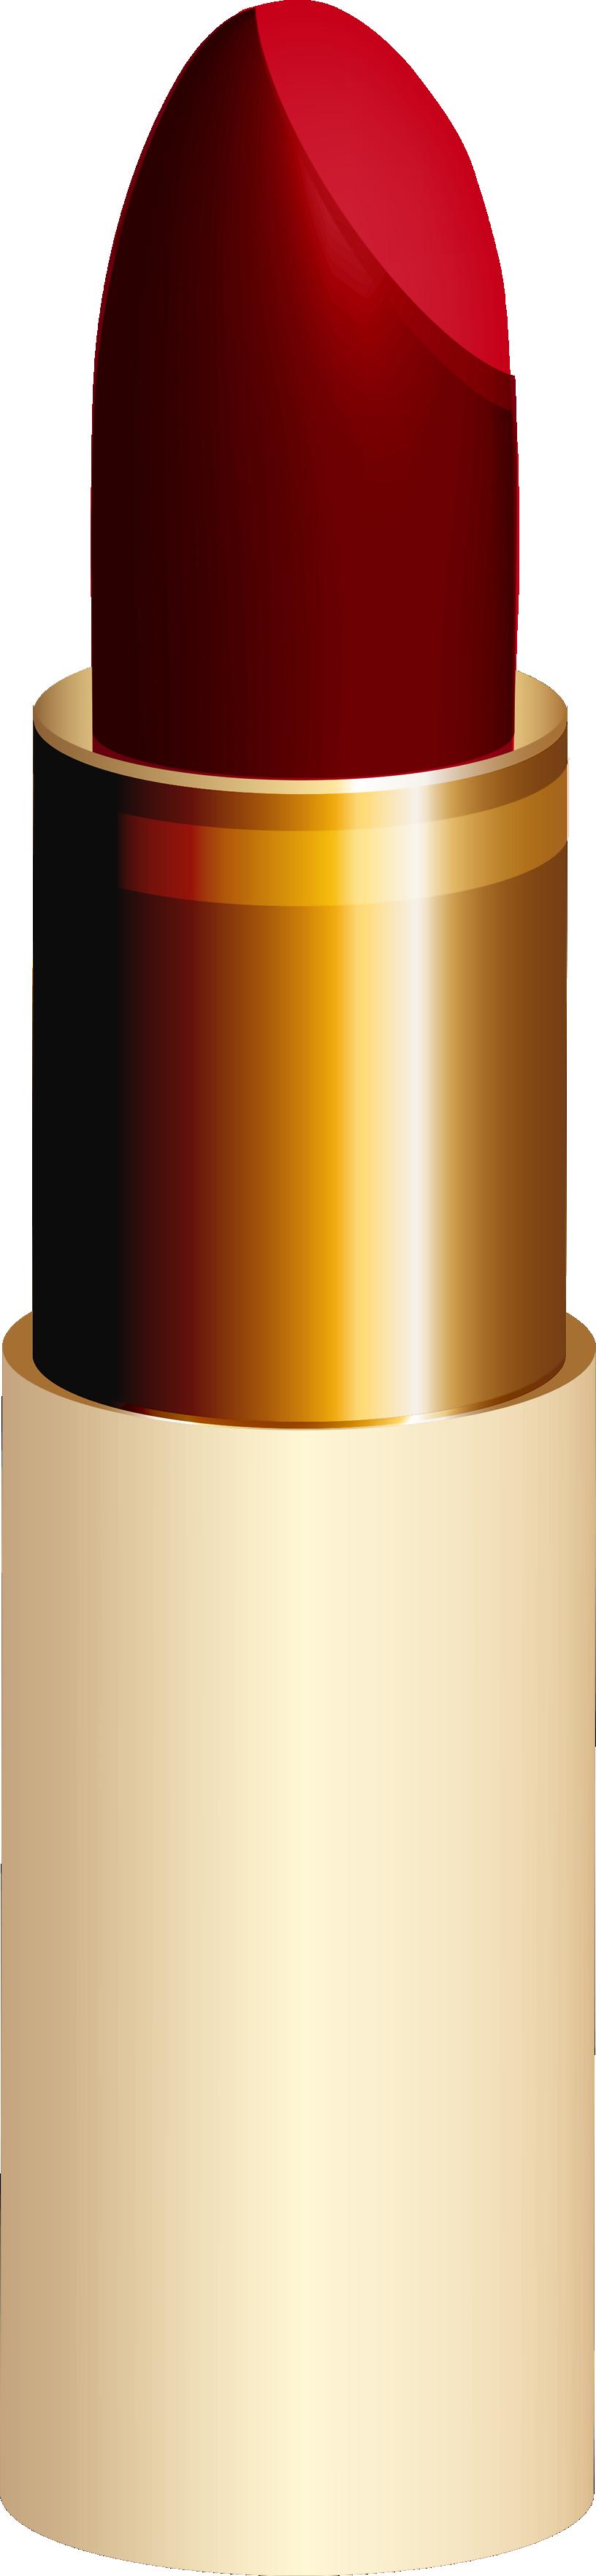 lipstick clipart gold lipstick